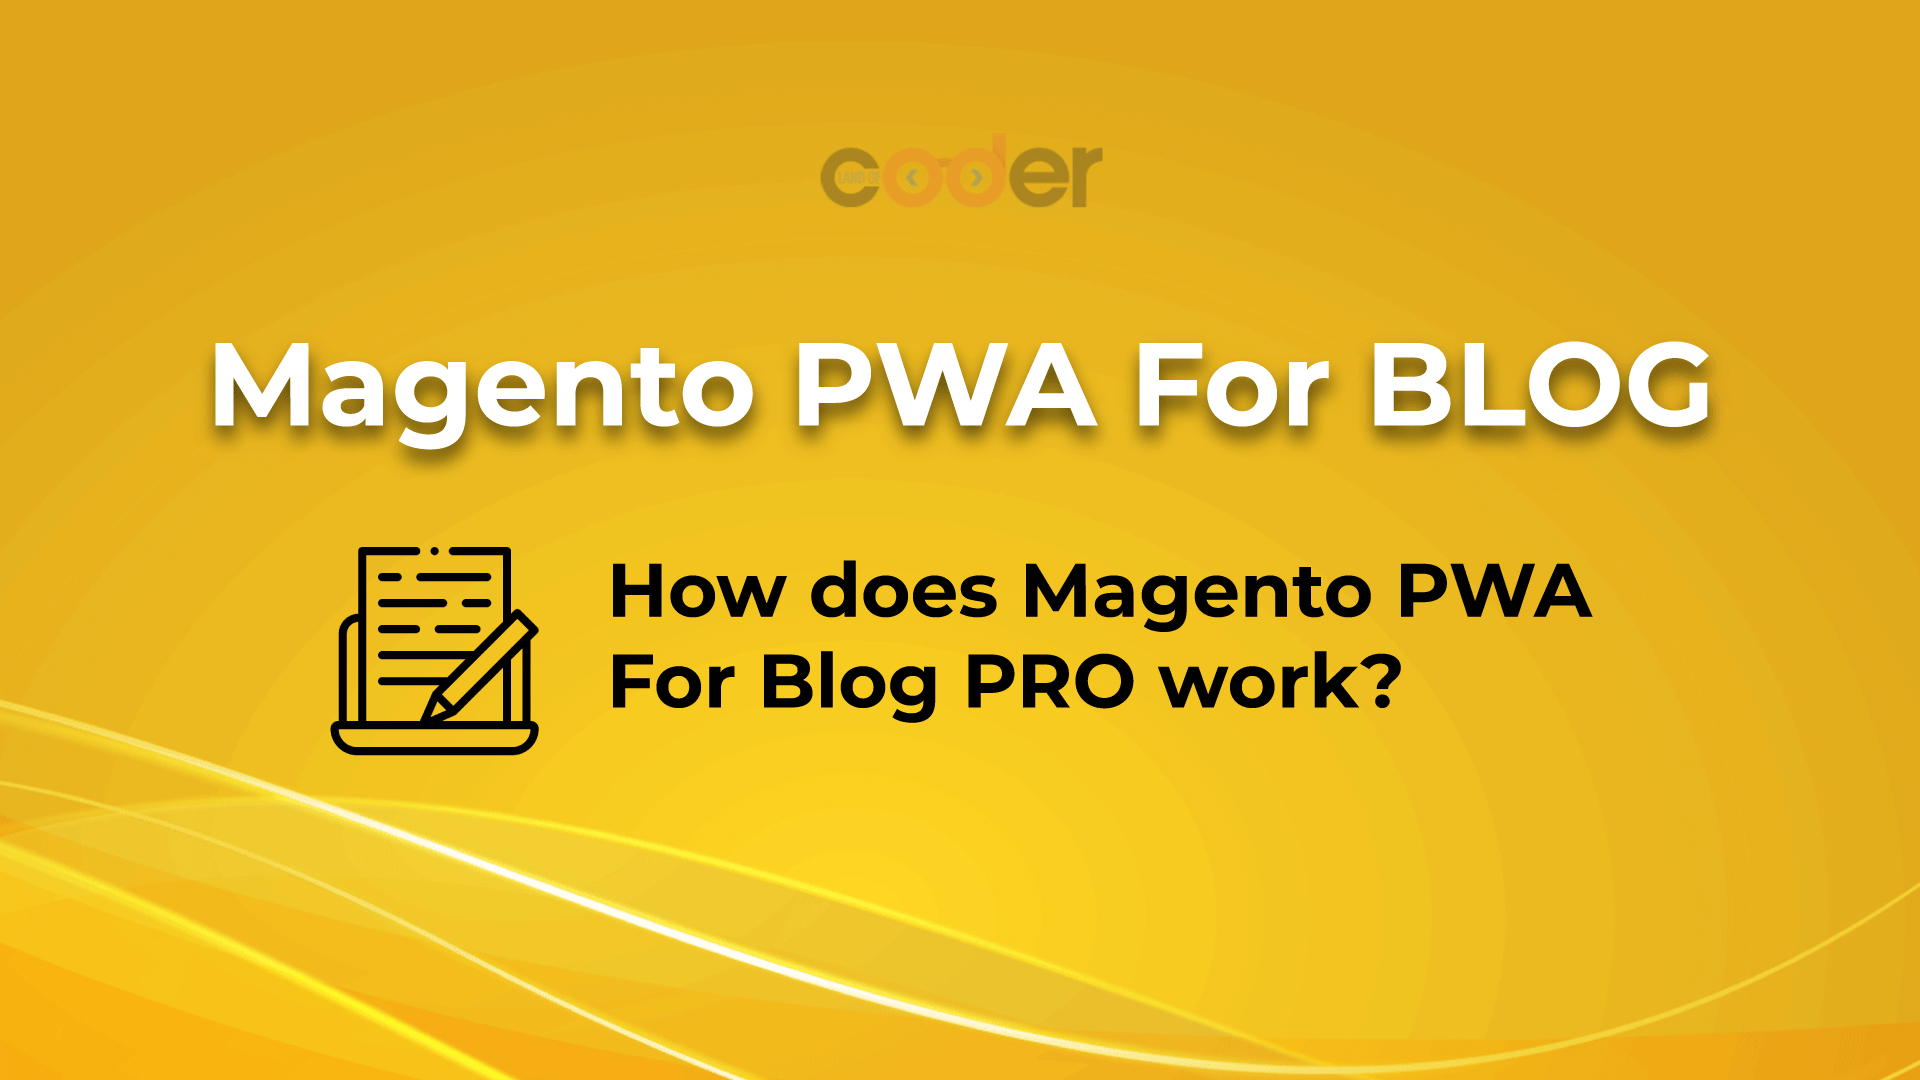 magento pwa for blog